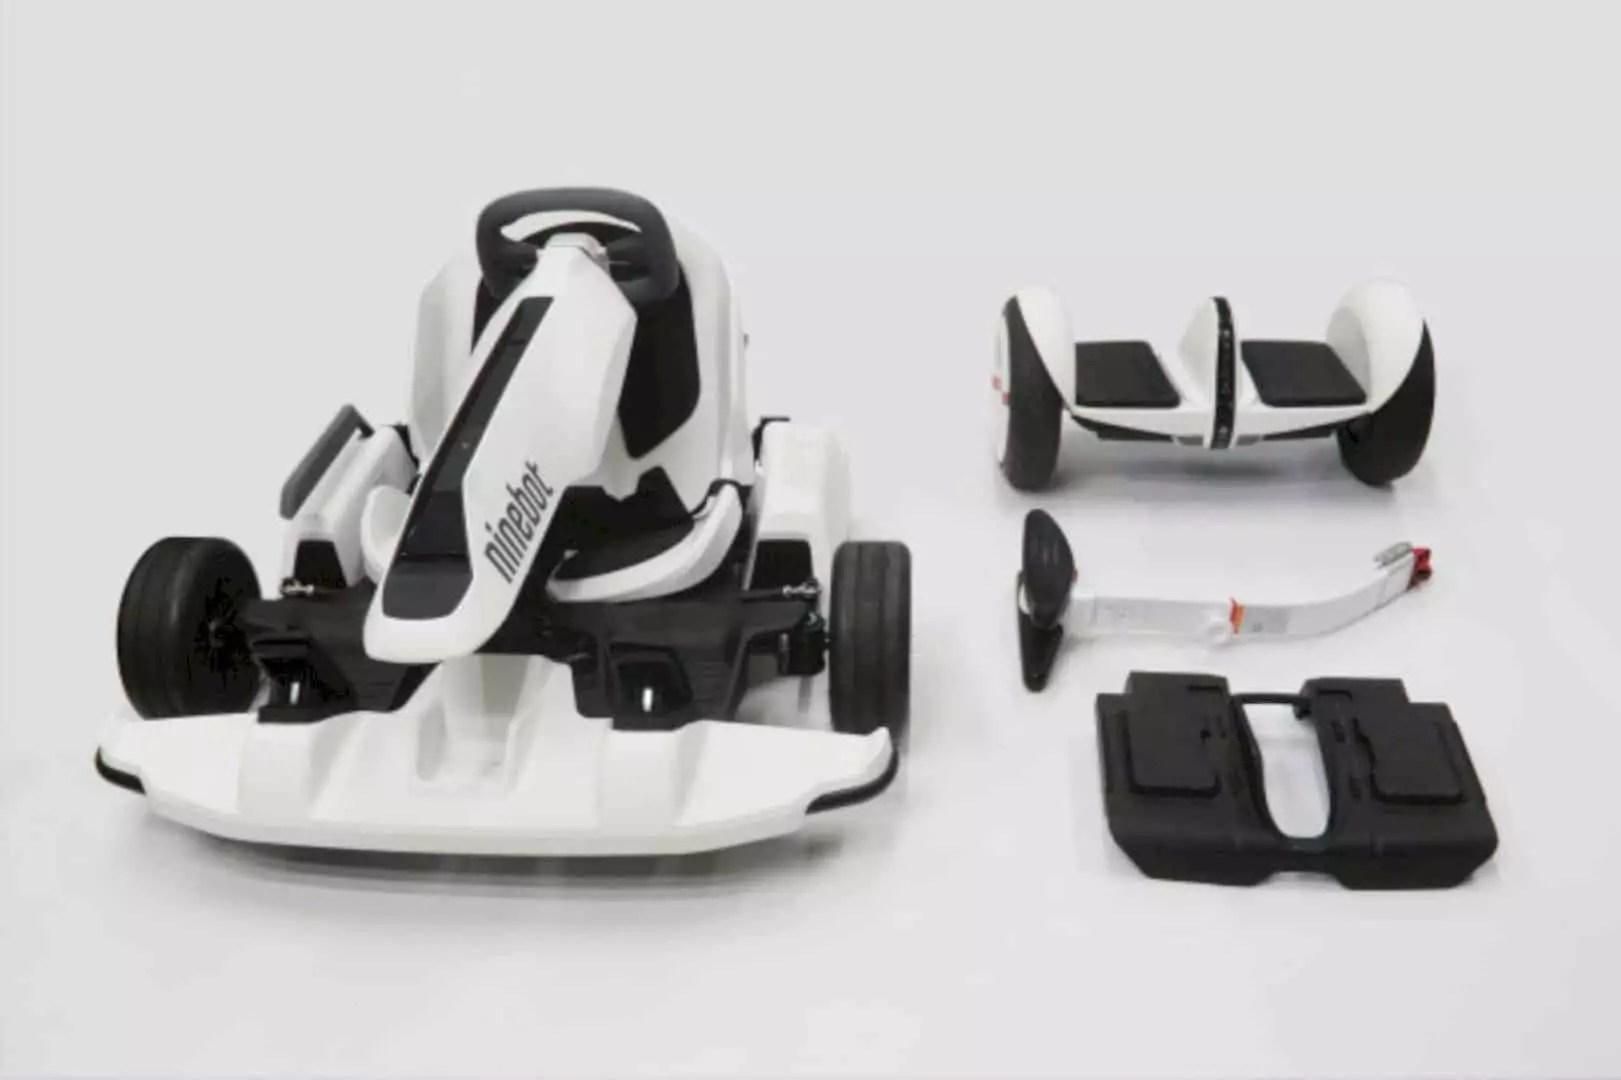 Ninebot Electric Gokart: The Cutting-Edge Electric Gokart